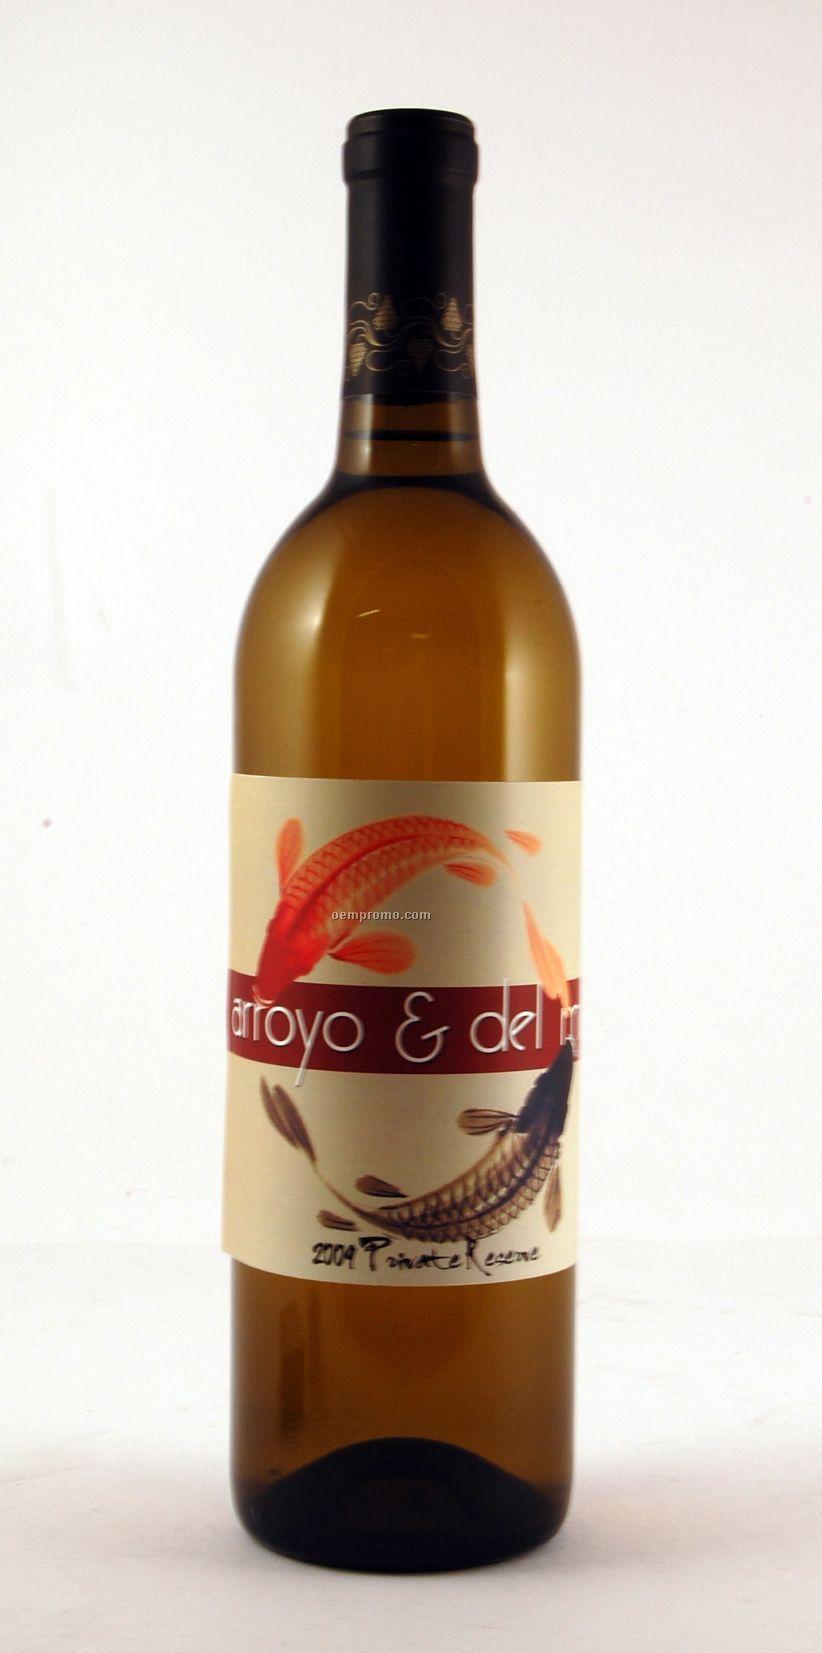 2009 Wv Pinot Grigio, California Private Reserve (Custom Labeled Wine)